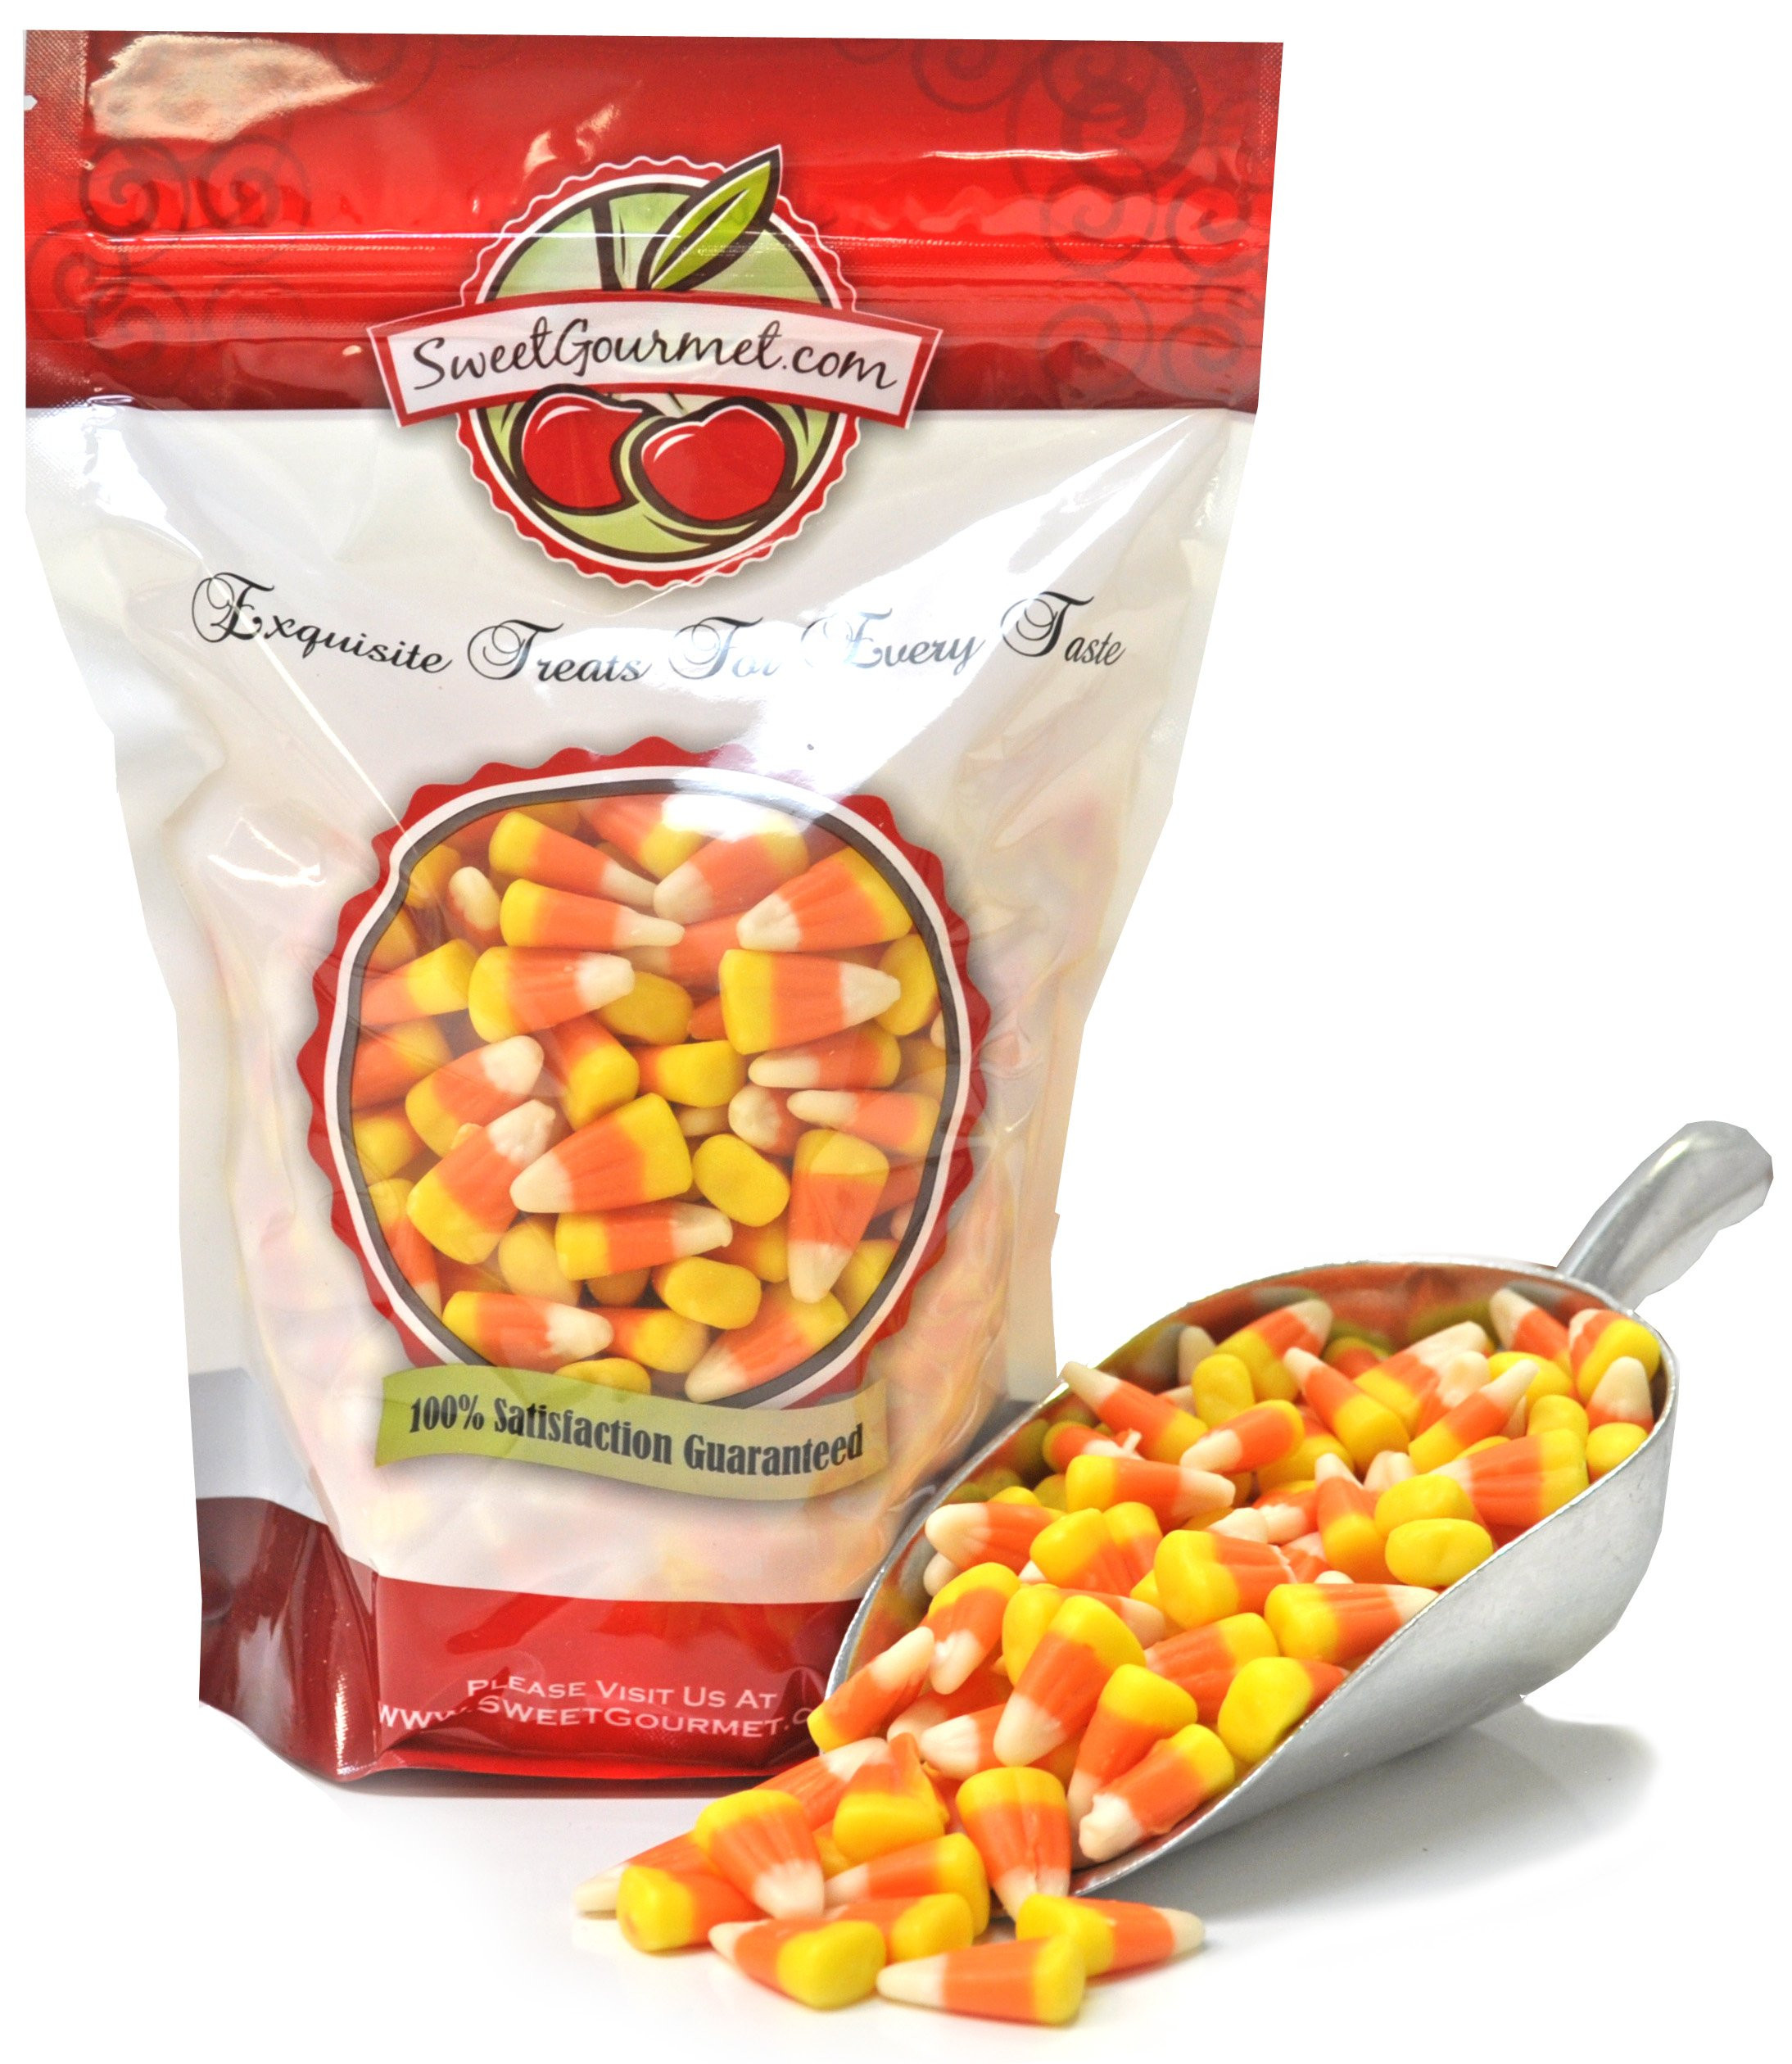 Mellowcreme Christmas Candy  Amazon Brach s Candy Cane Candy Corn 15oz Grocery